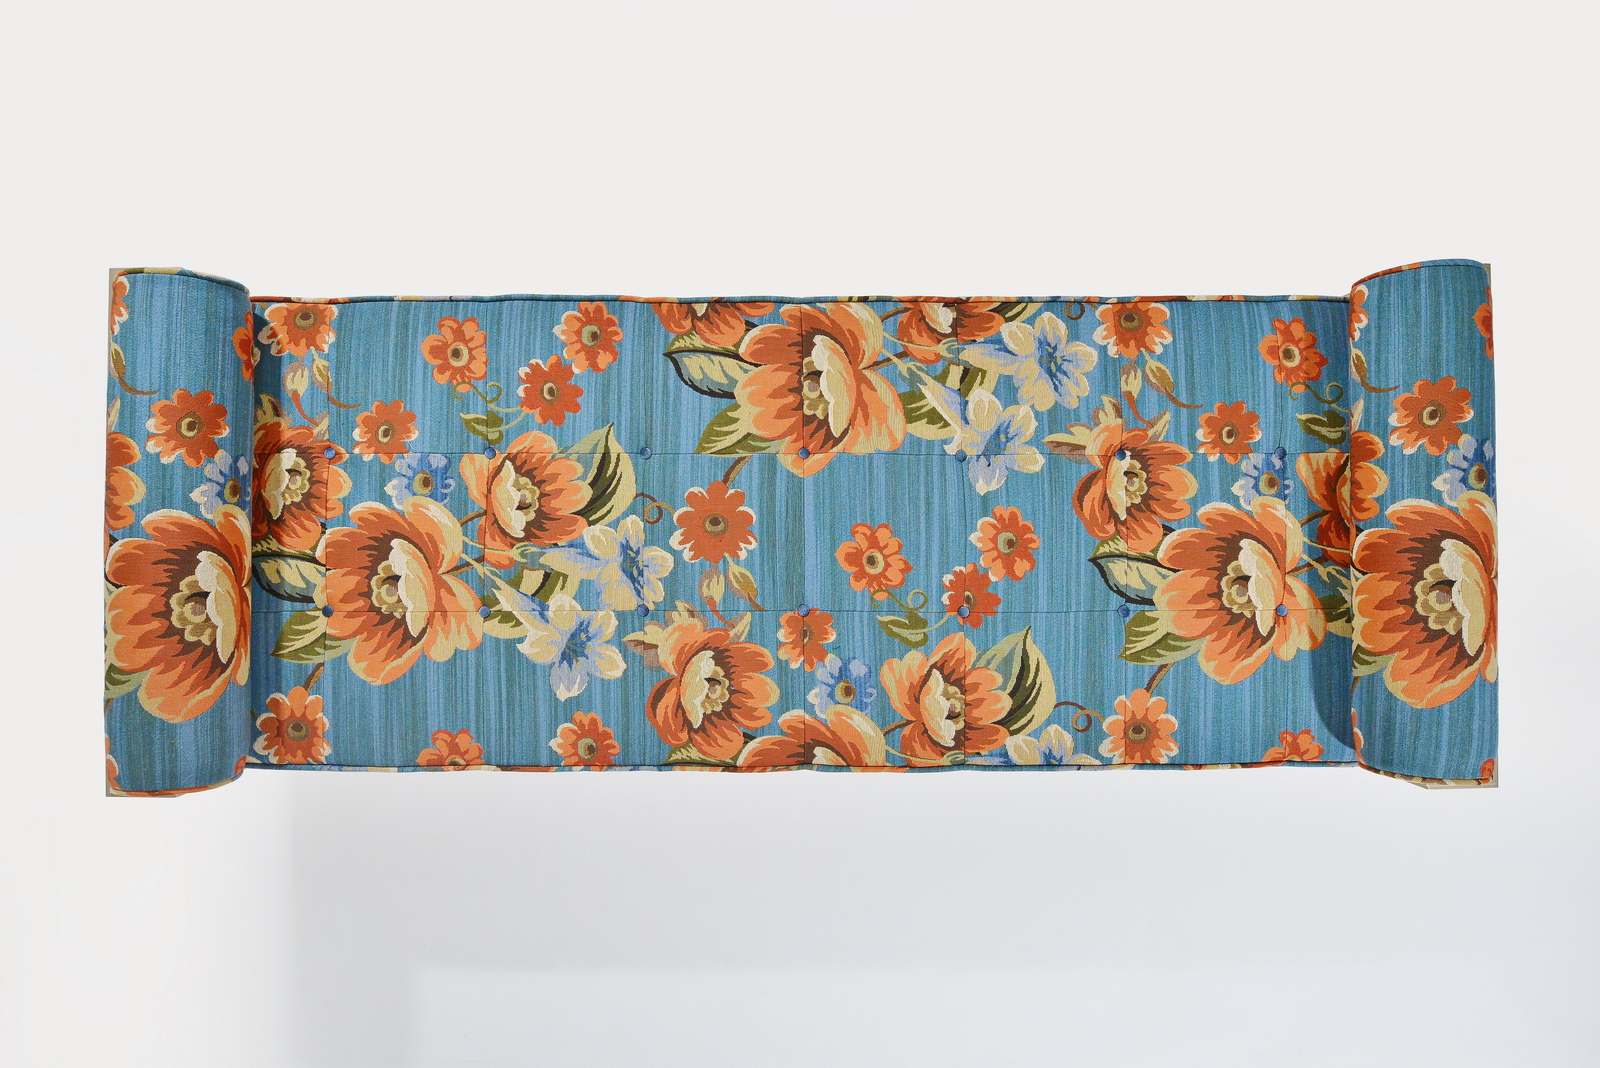 PTendercool-Sofa-PT76-BS1-TE-NO-JD&CO (Garden Tapestry)-190903-07